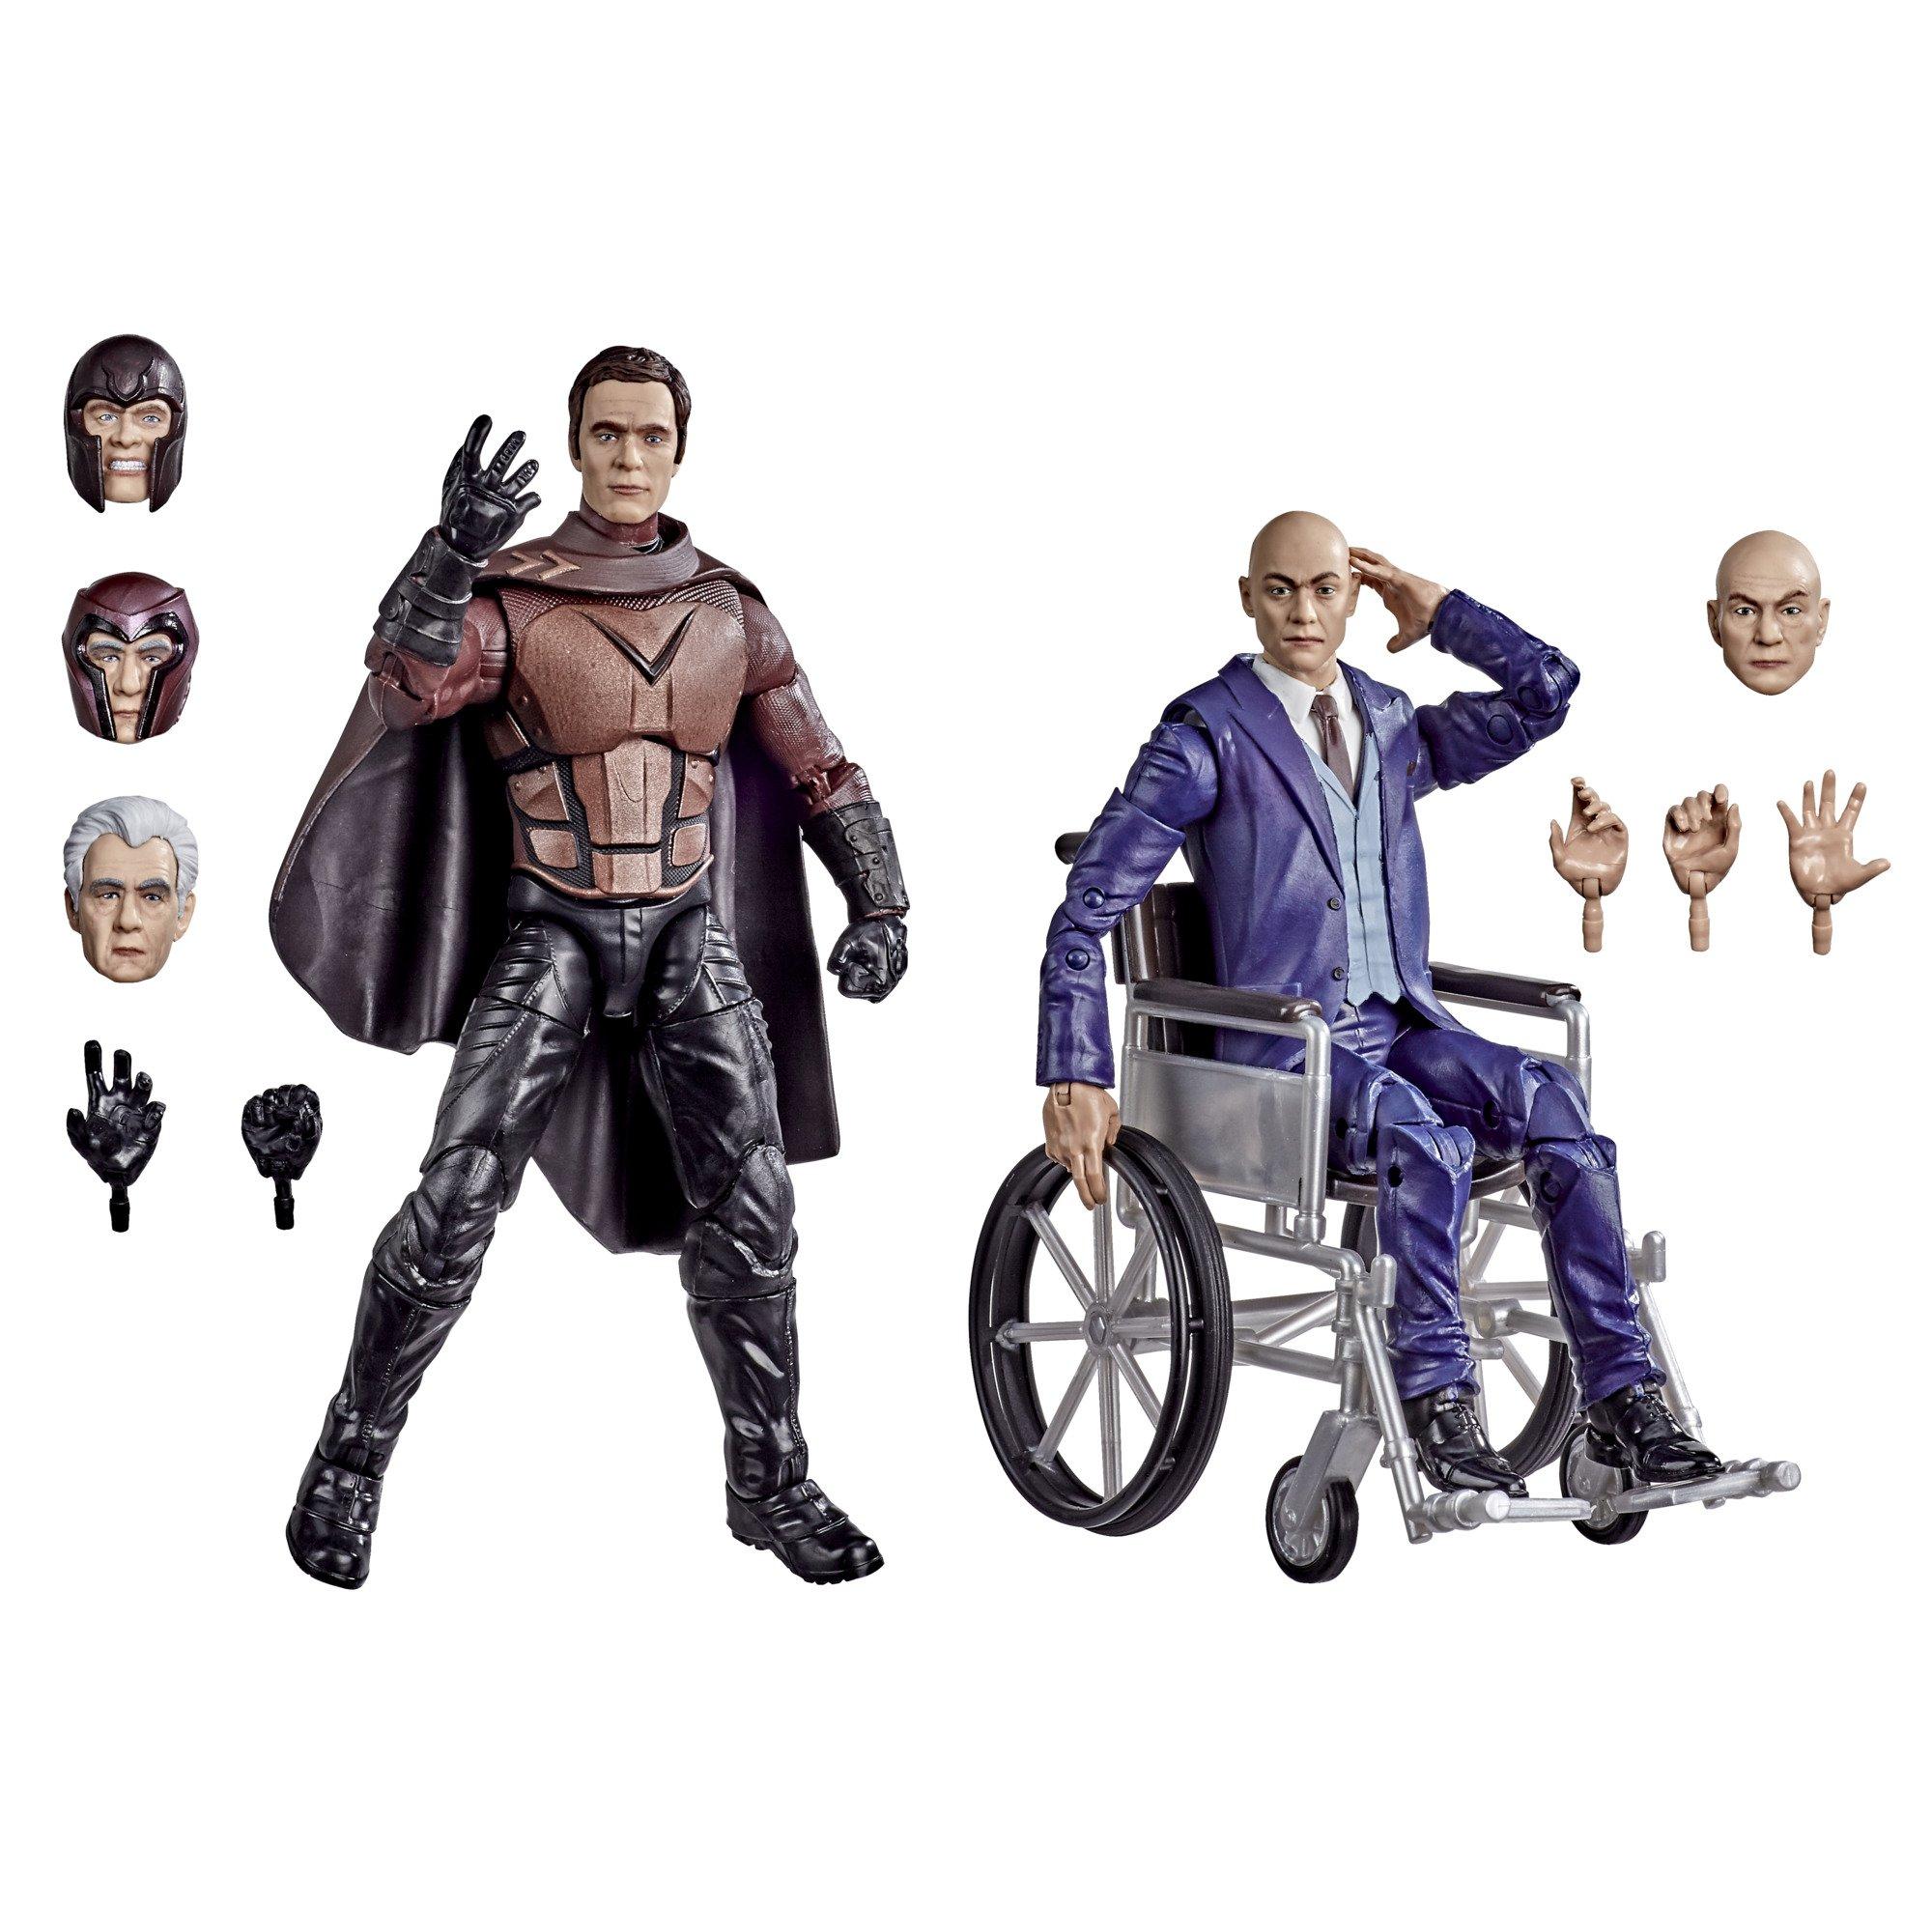 HASBRO MARVEL legends X-MEN MARVEL la mystique Action Figure